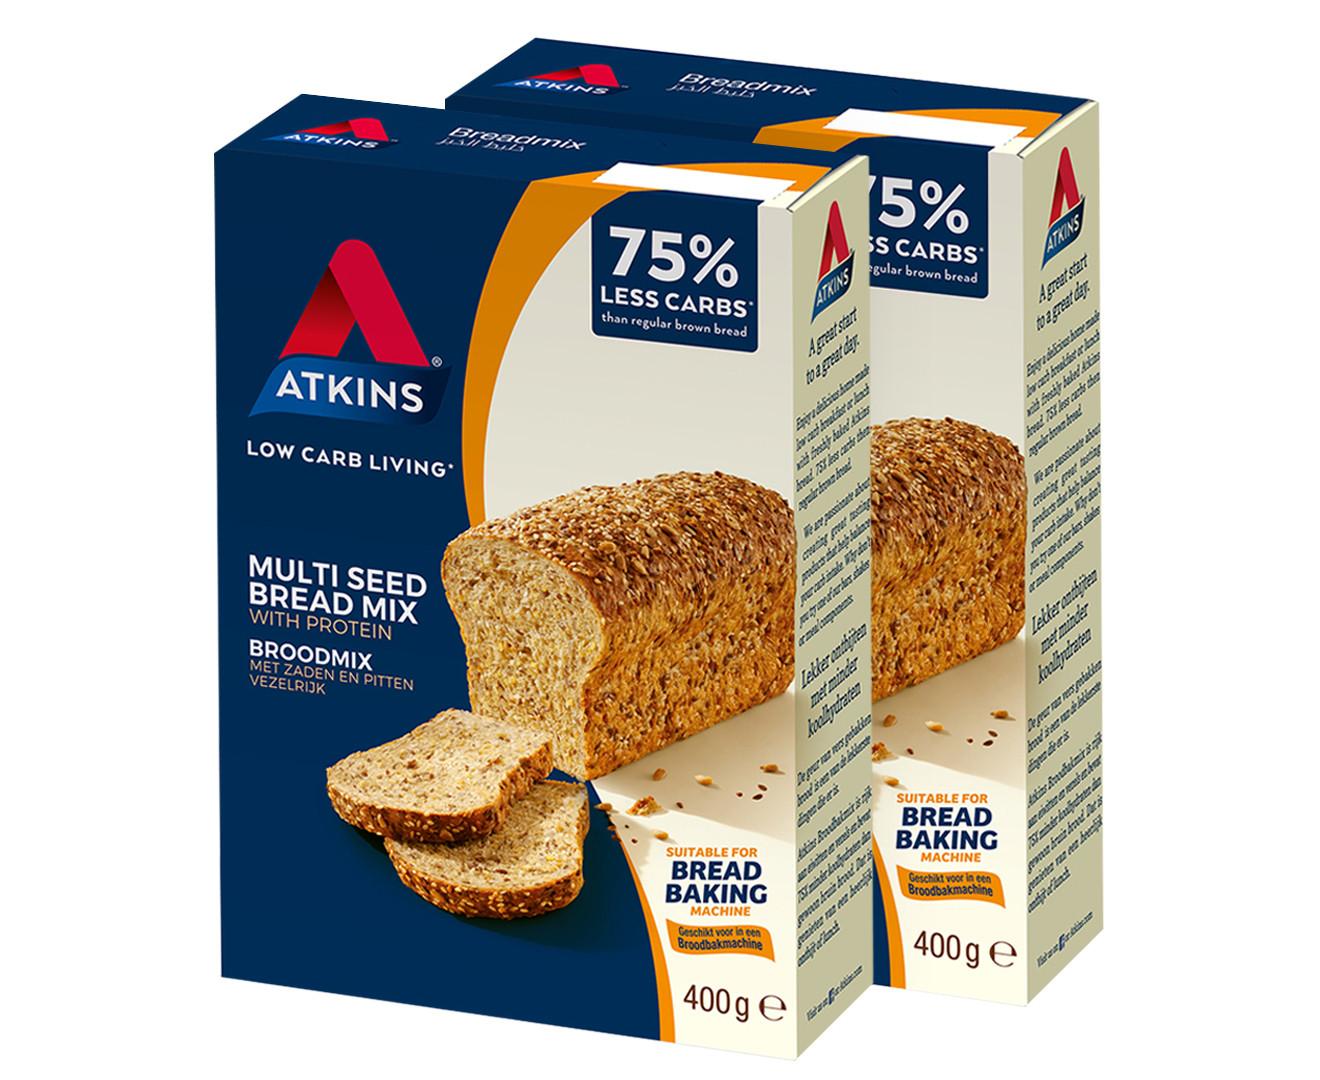 Atkins Low Carb Bread  2 x Atkins Low Carb Multi Seed Bread Mix 400g